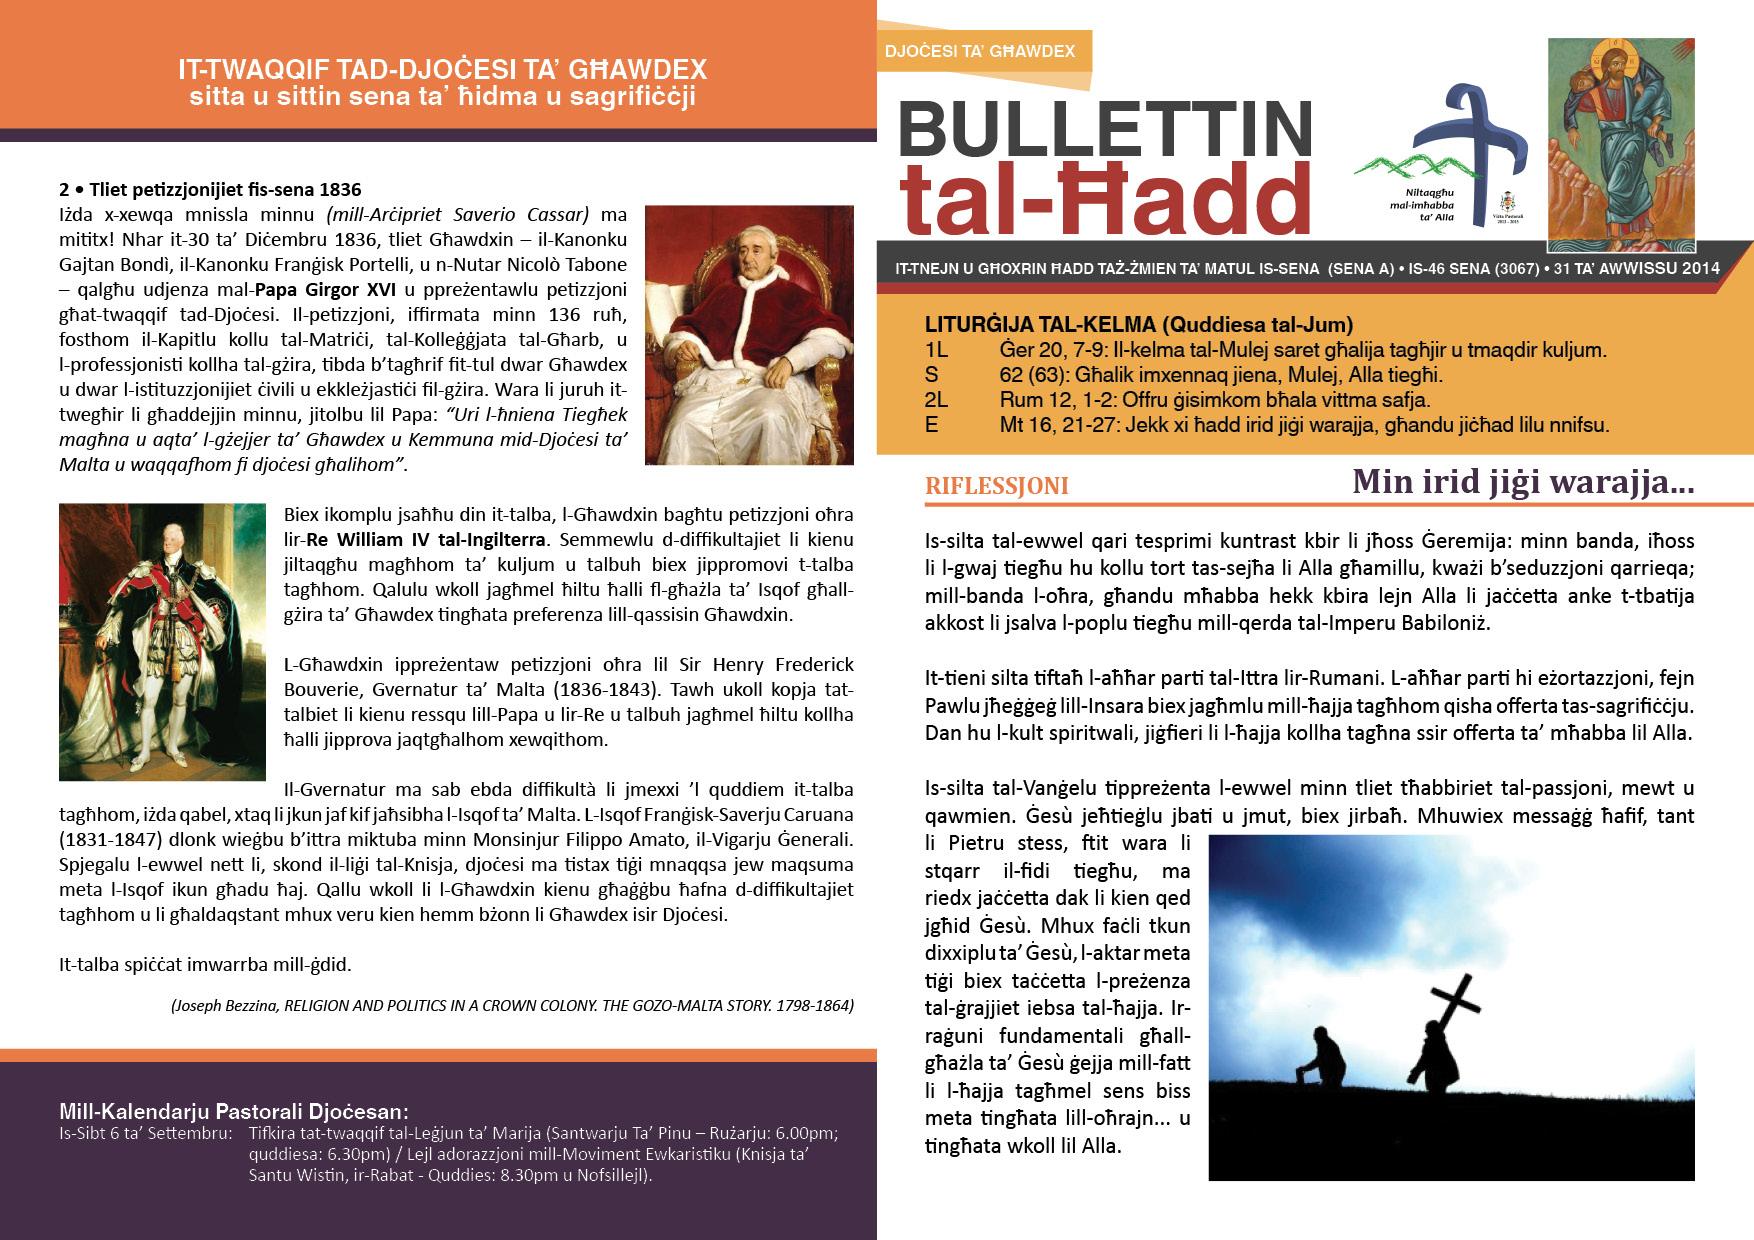 bullettin-2014-awwissu-31.jpg